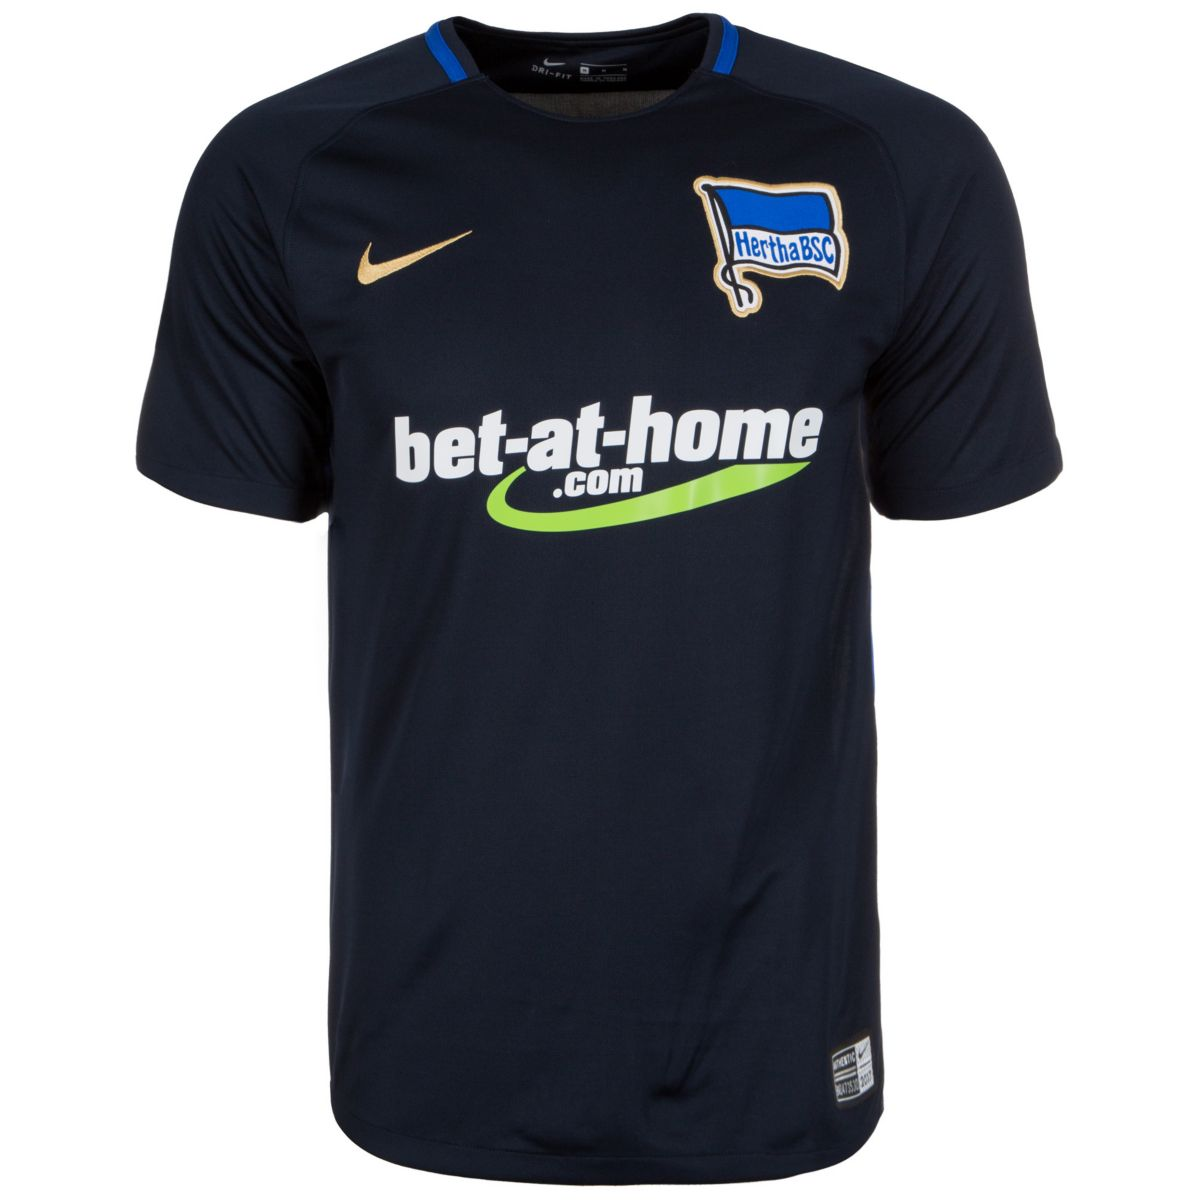 Nike Fußballtrikot »Hertha Bsc Stadium 17/18 Au...